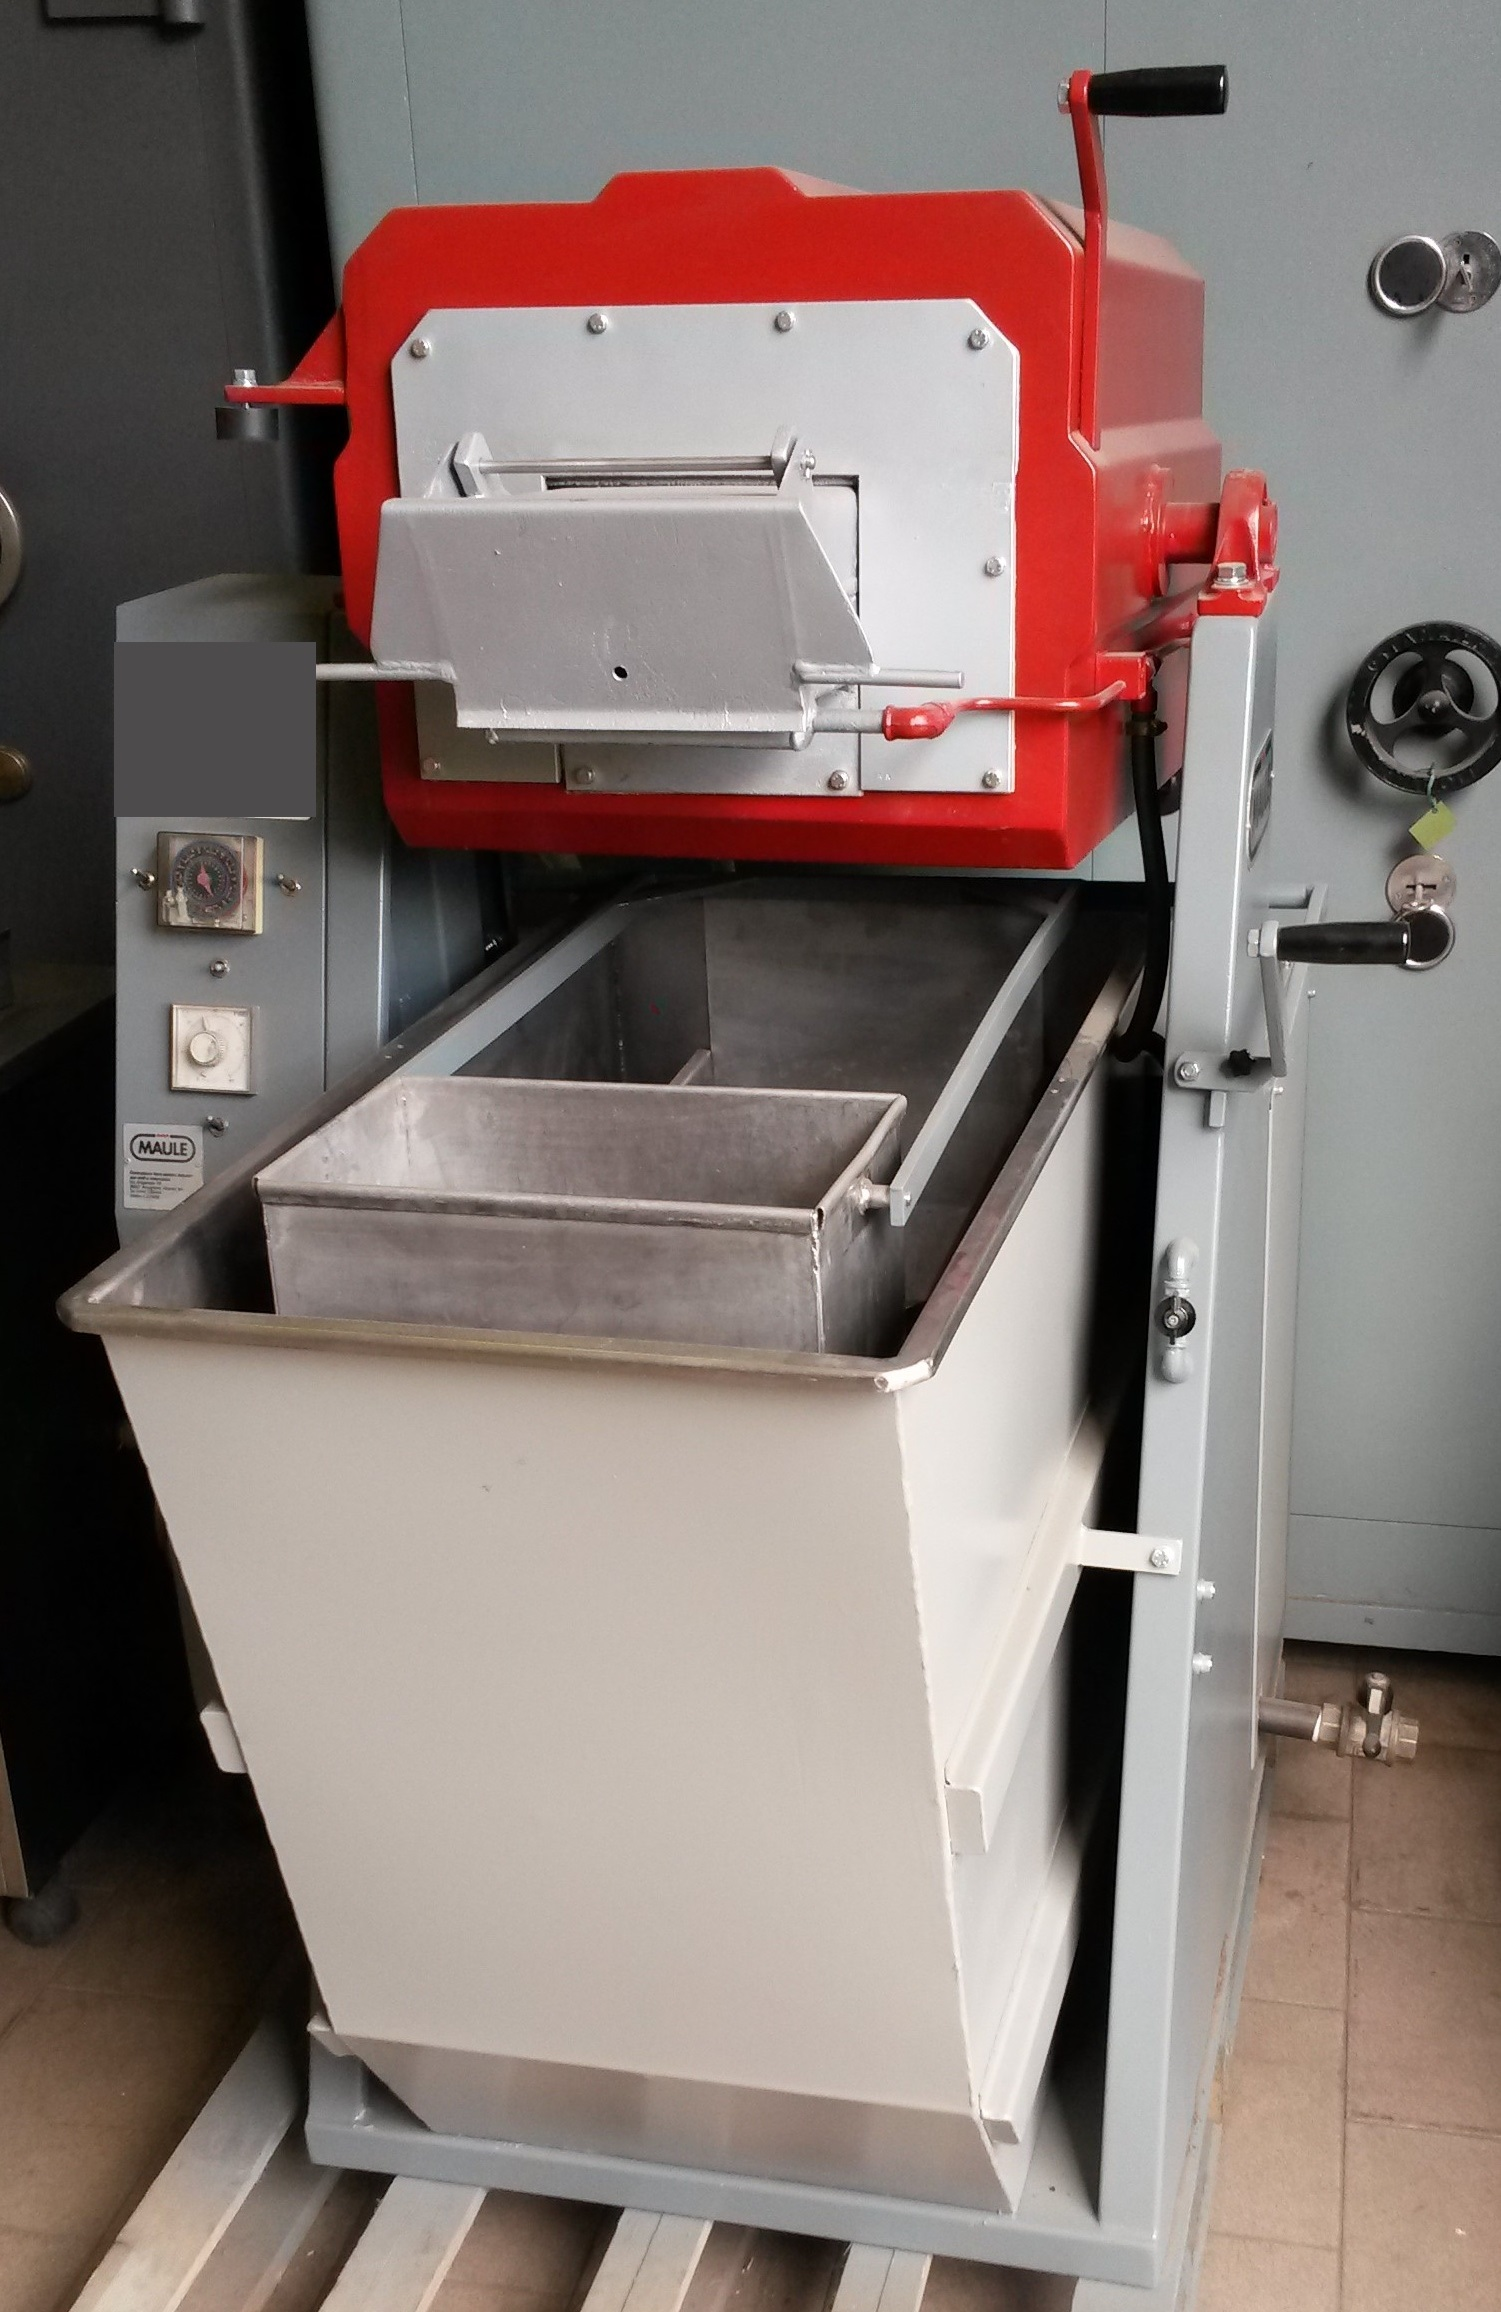 Anealling furnace Mod. Maule Image